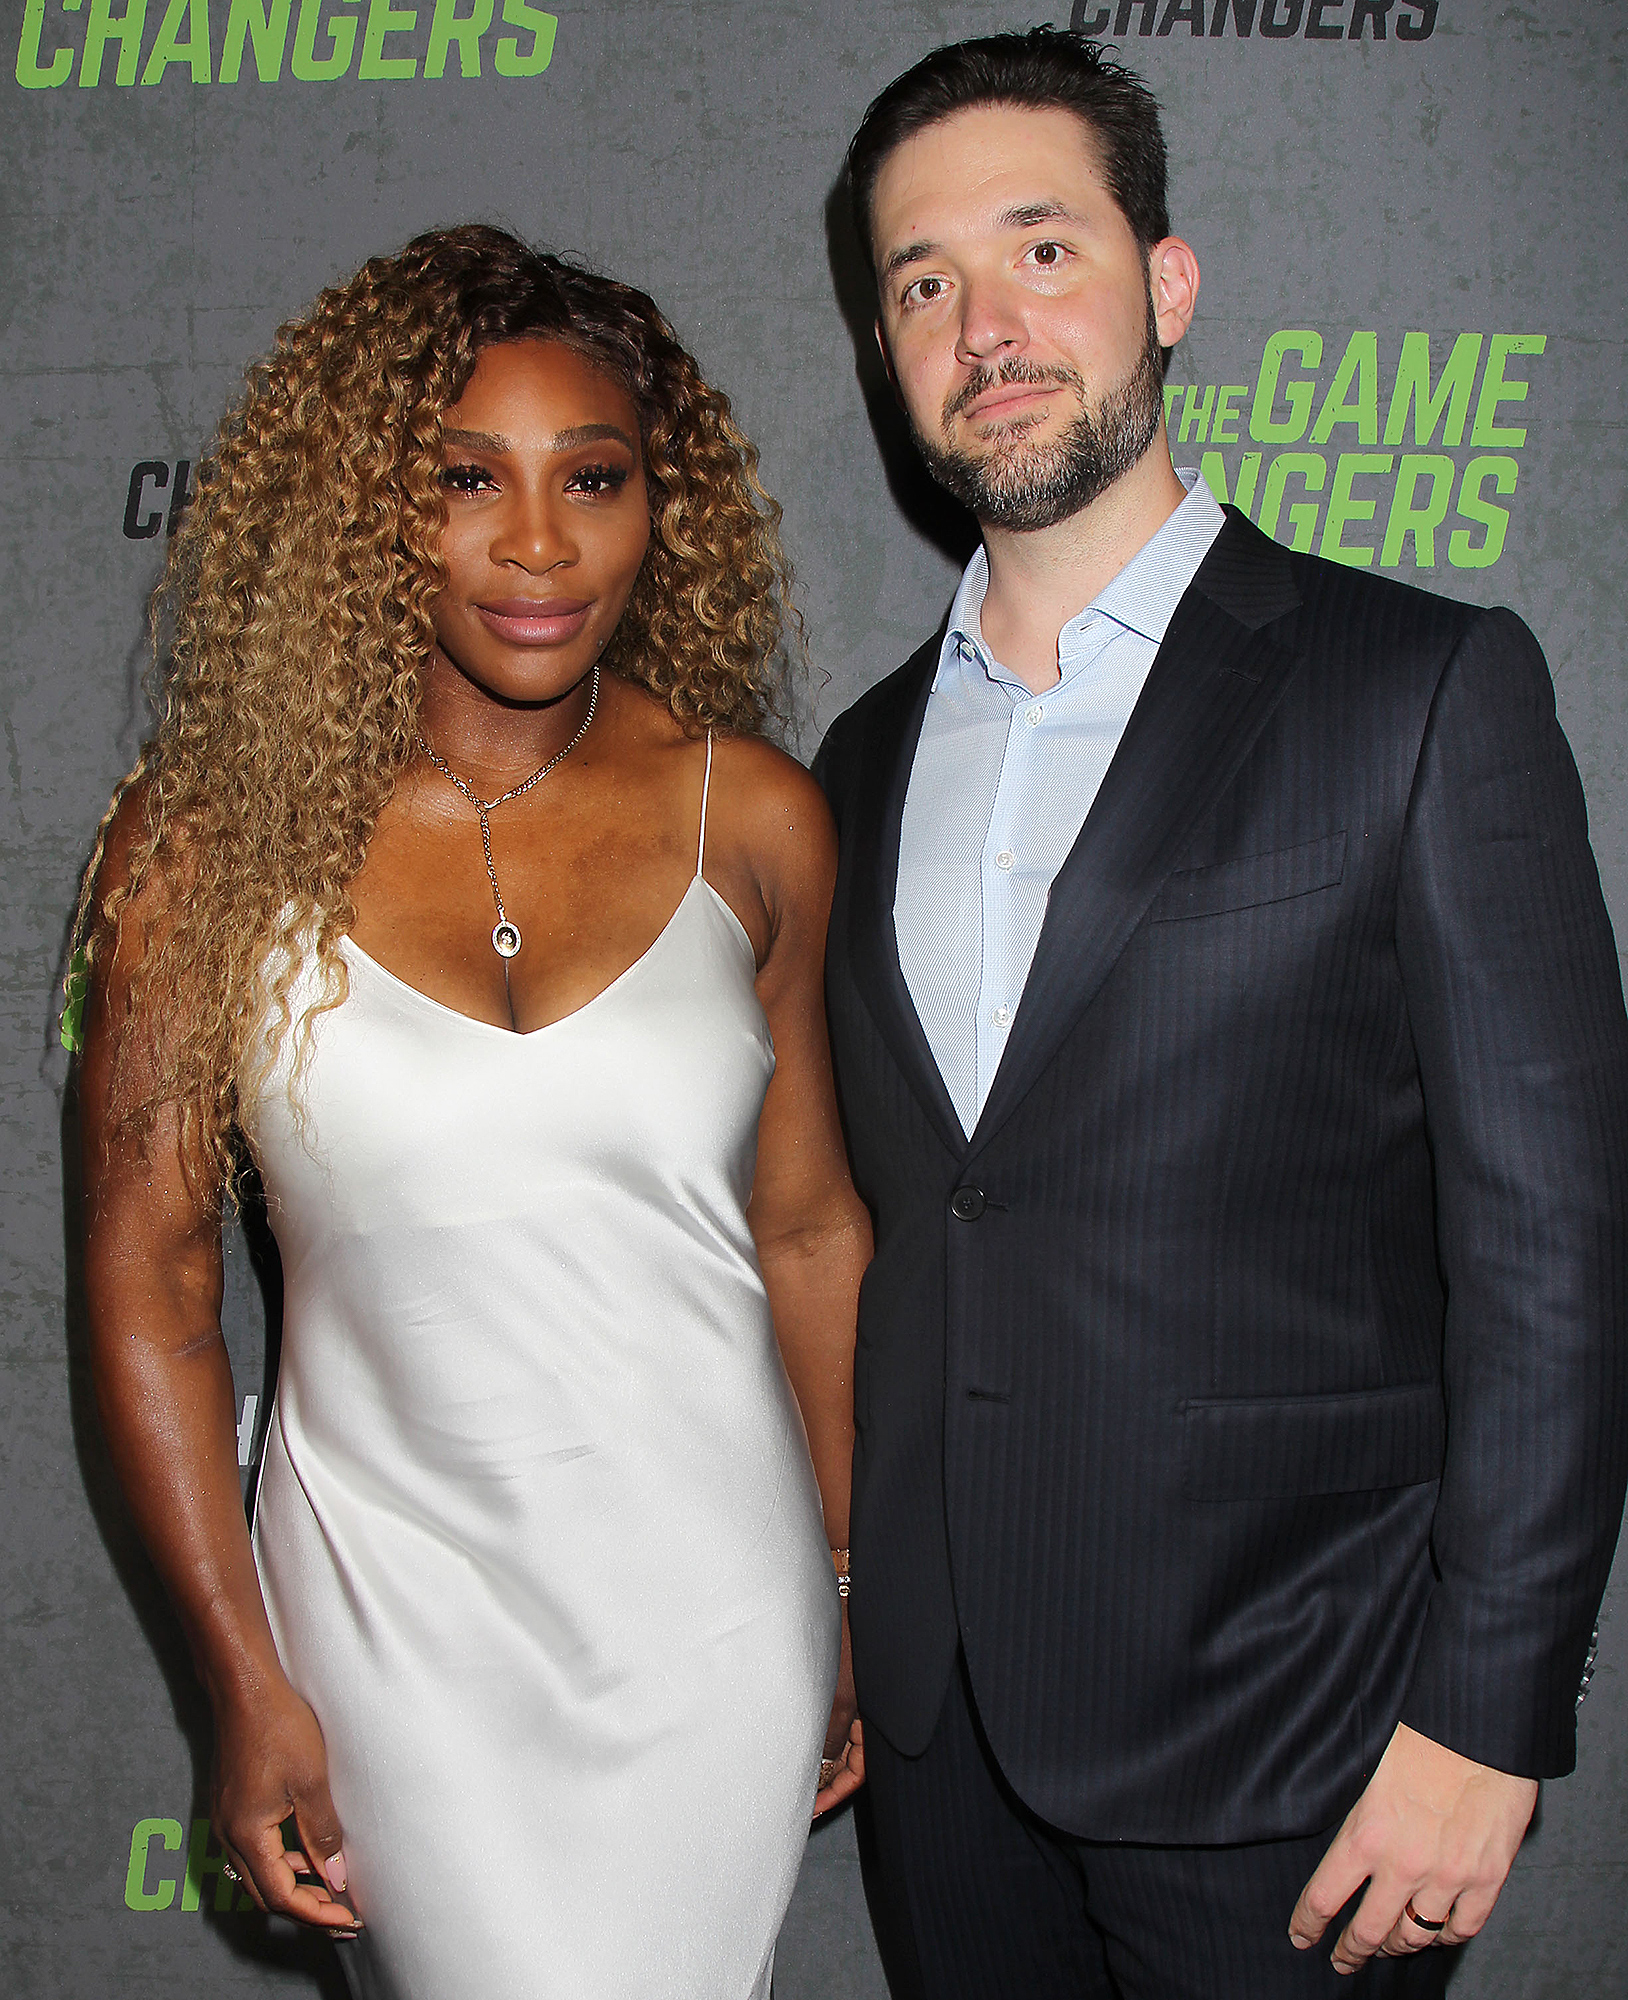 Husband serena williams Meet Serena